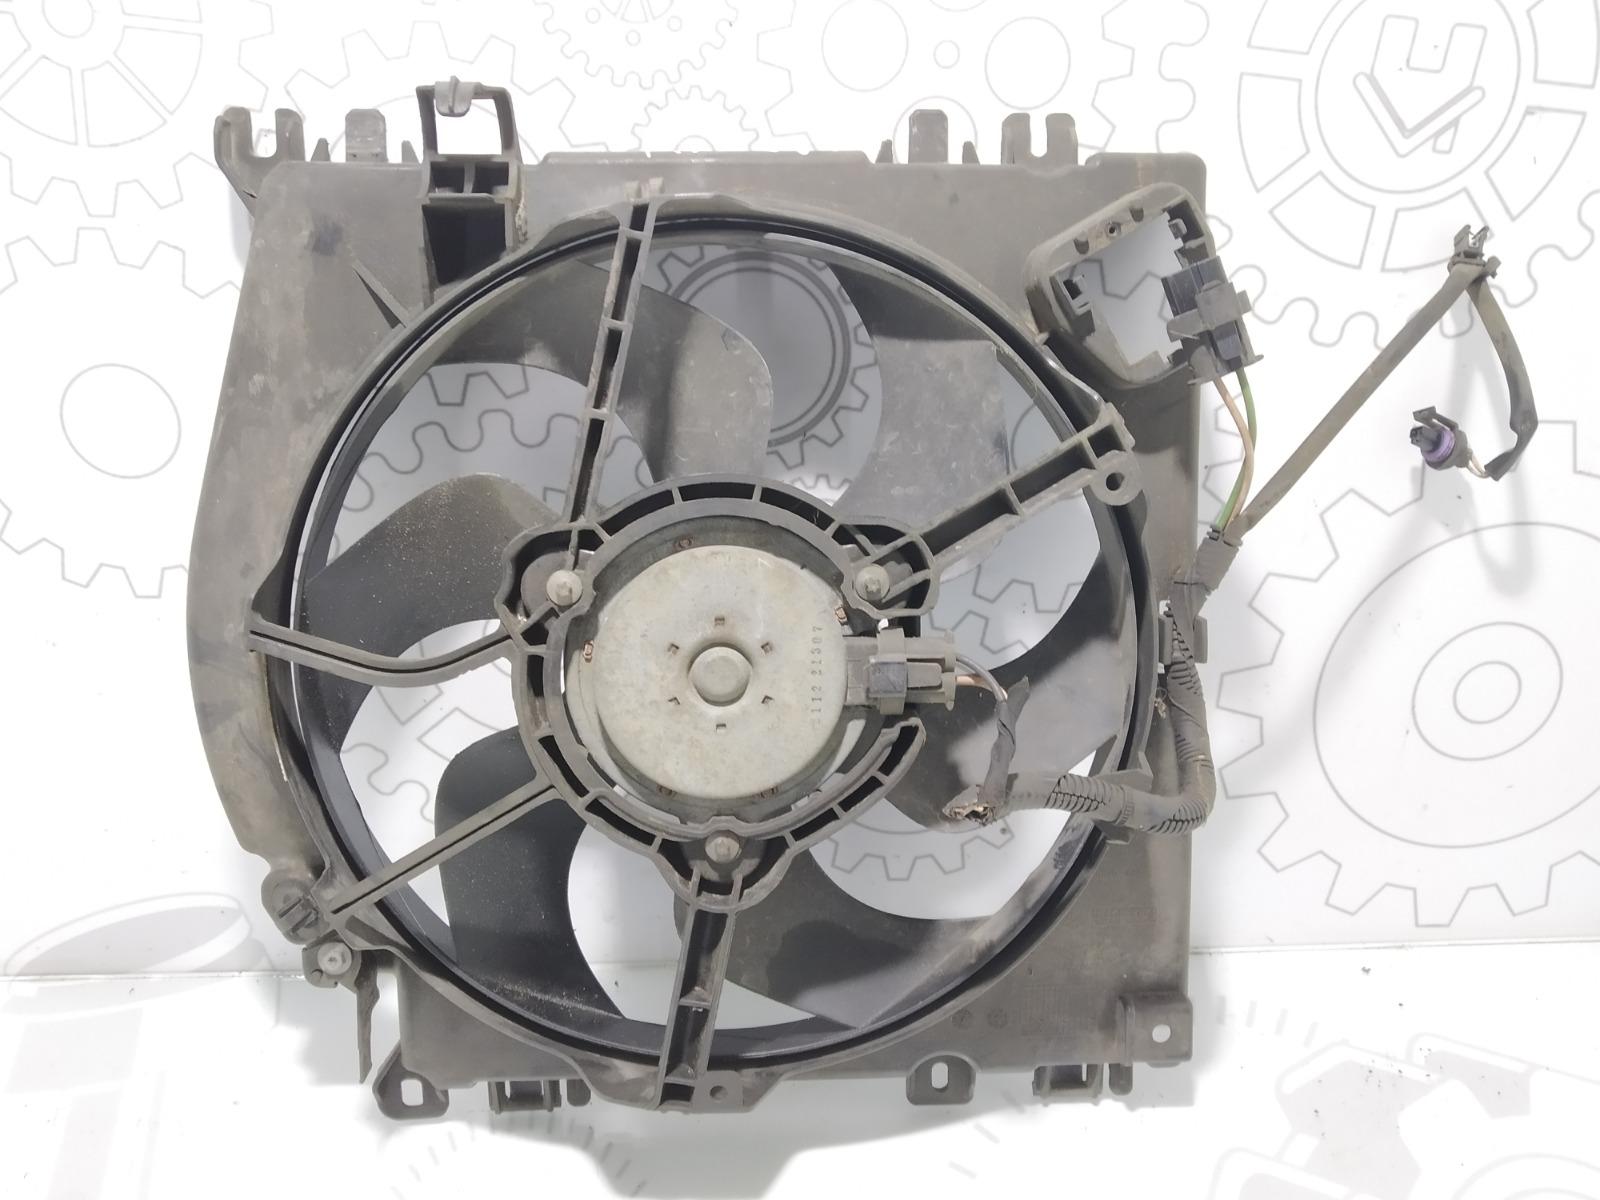 Вентилятор радиатора Renault Grand Modus 1.5 DCI 2008 (б/у)